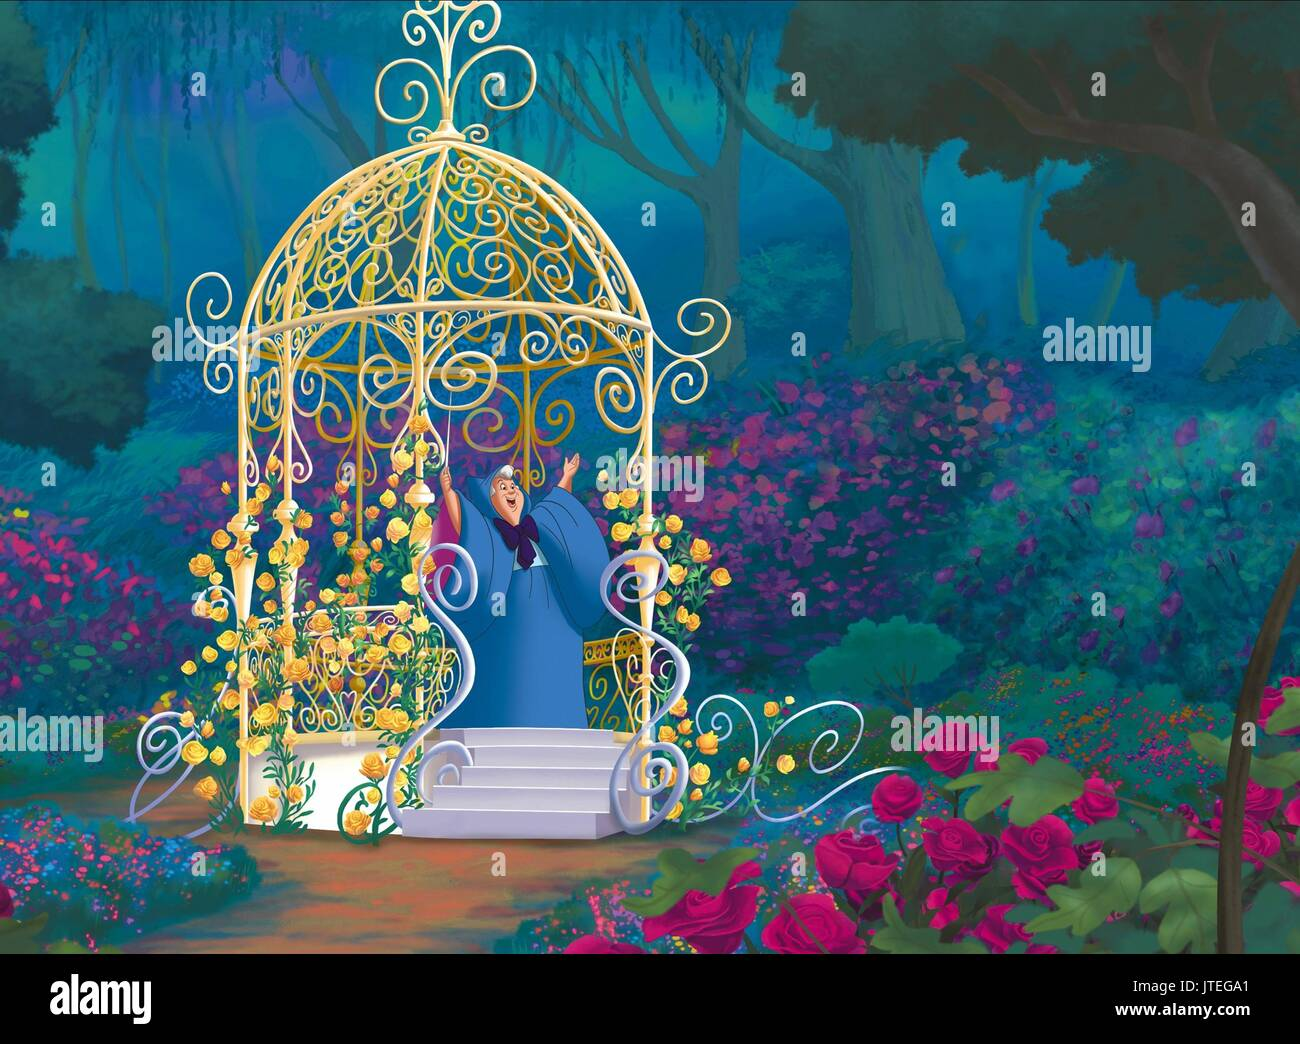 Fairy Godmother Stock Photos & Fairy Godmother Stock Images - Alamy